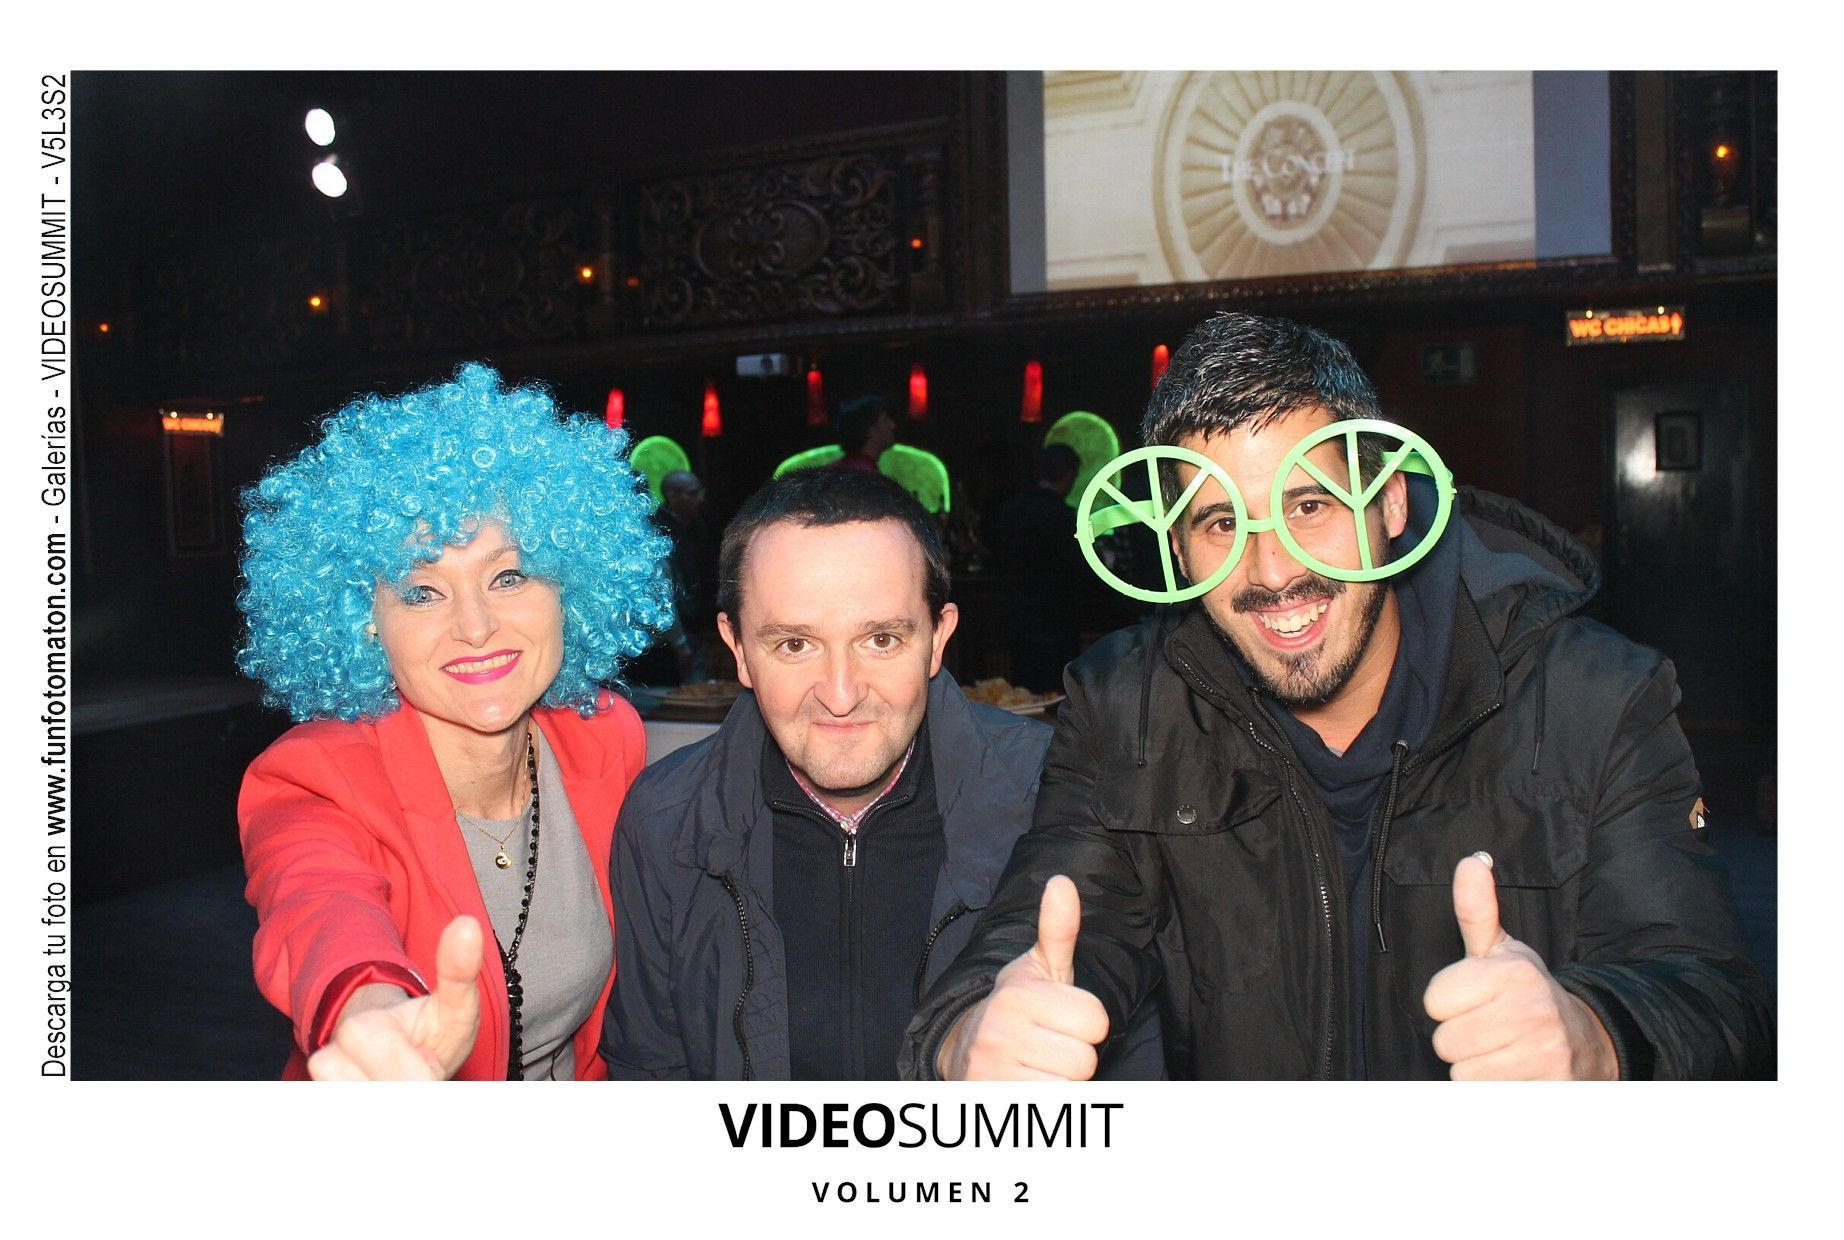 videosummit-vol2-club-party-074